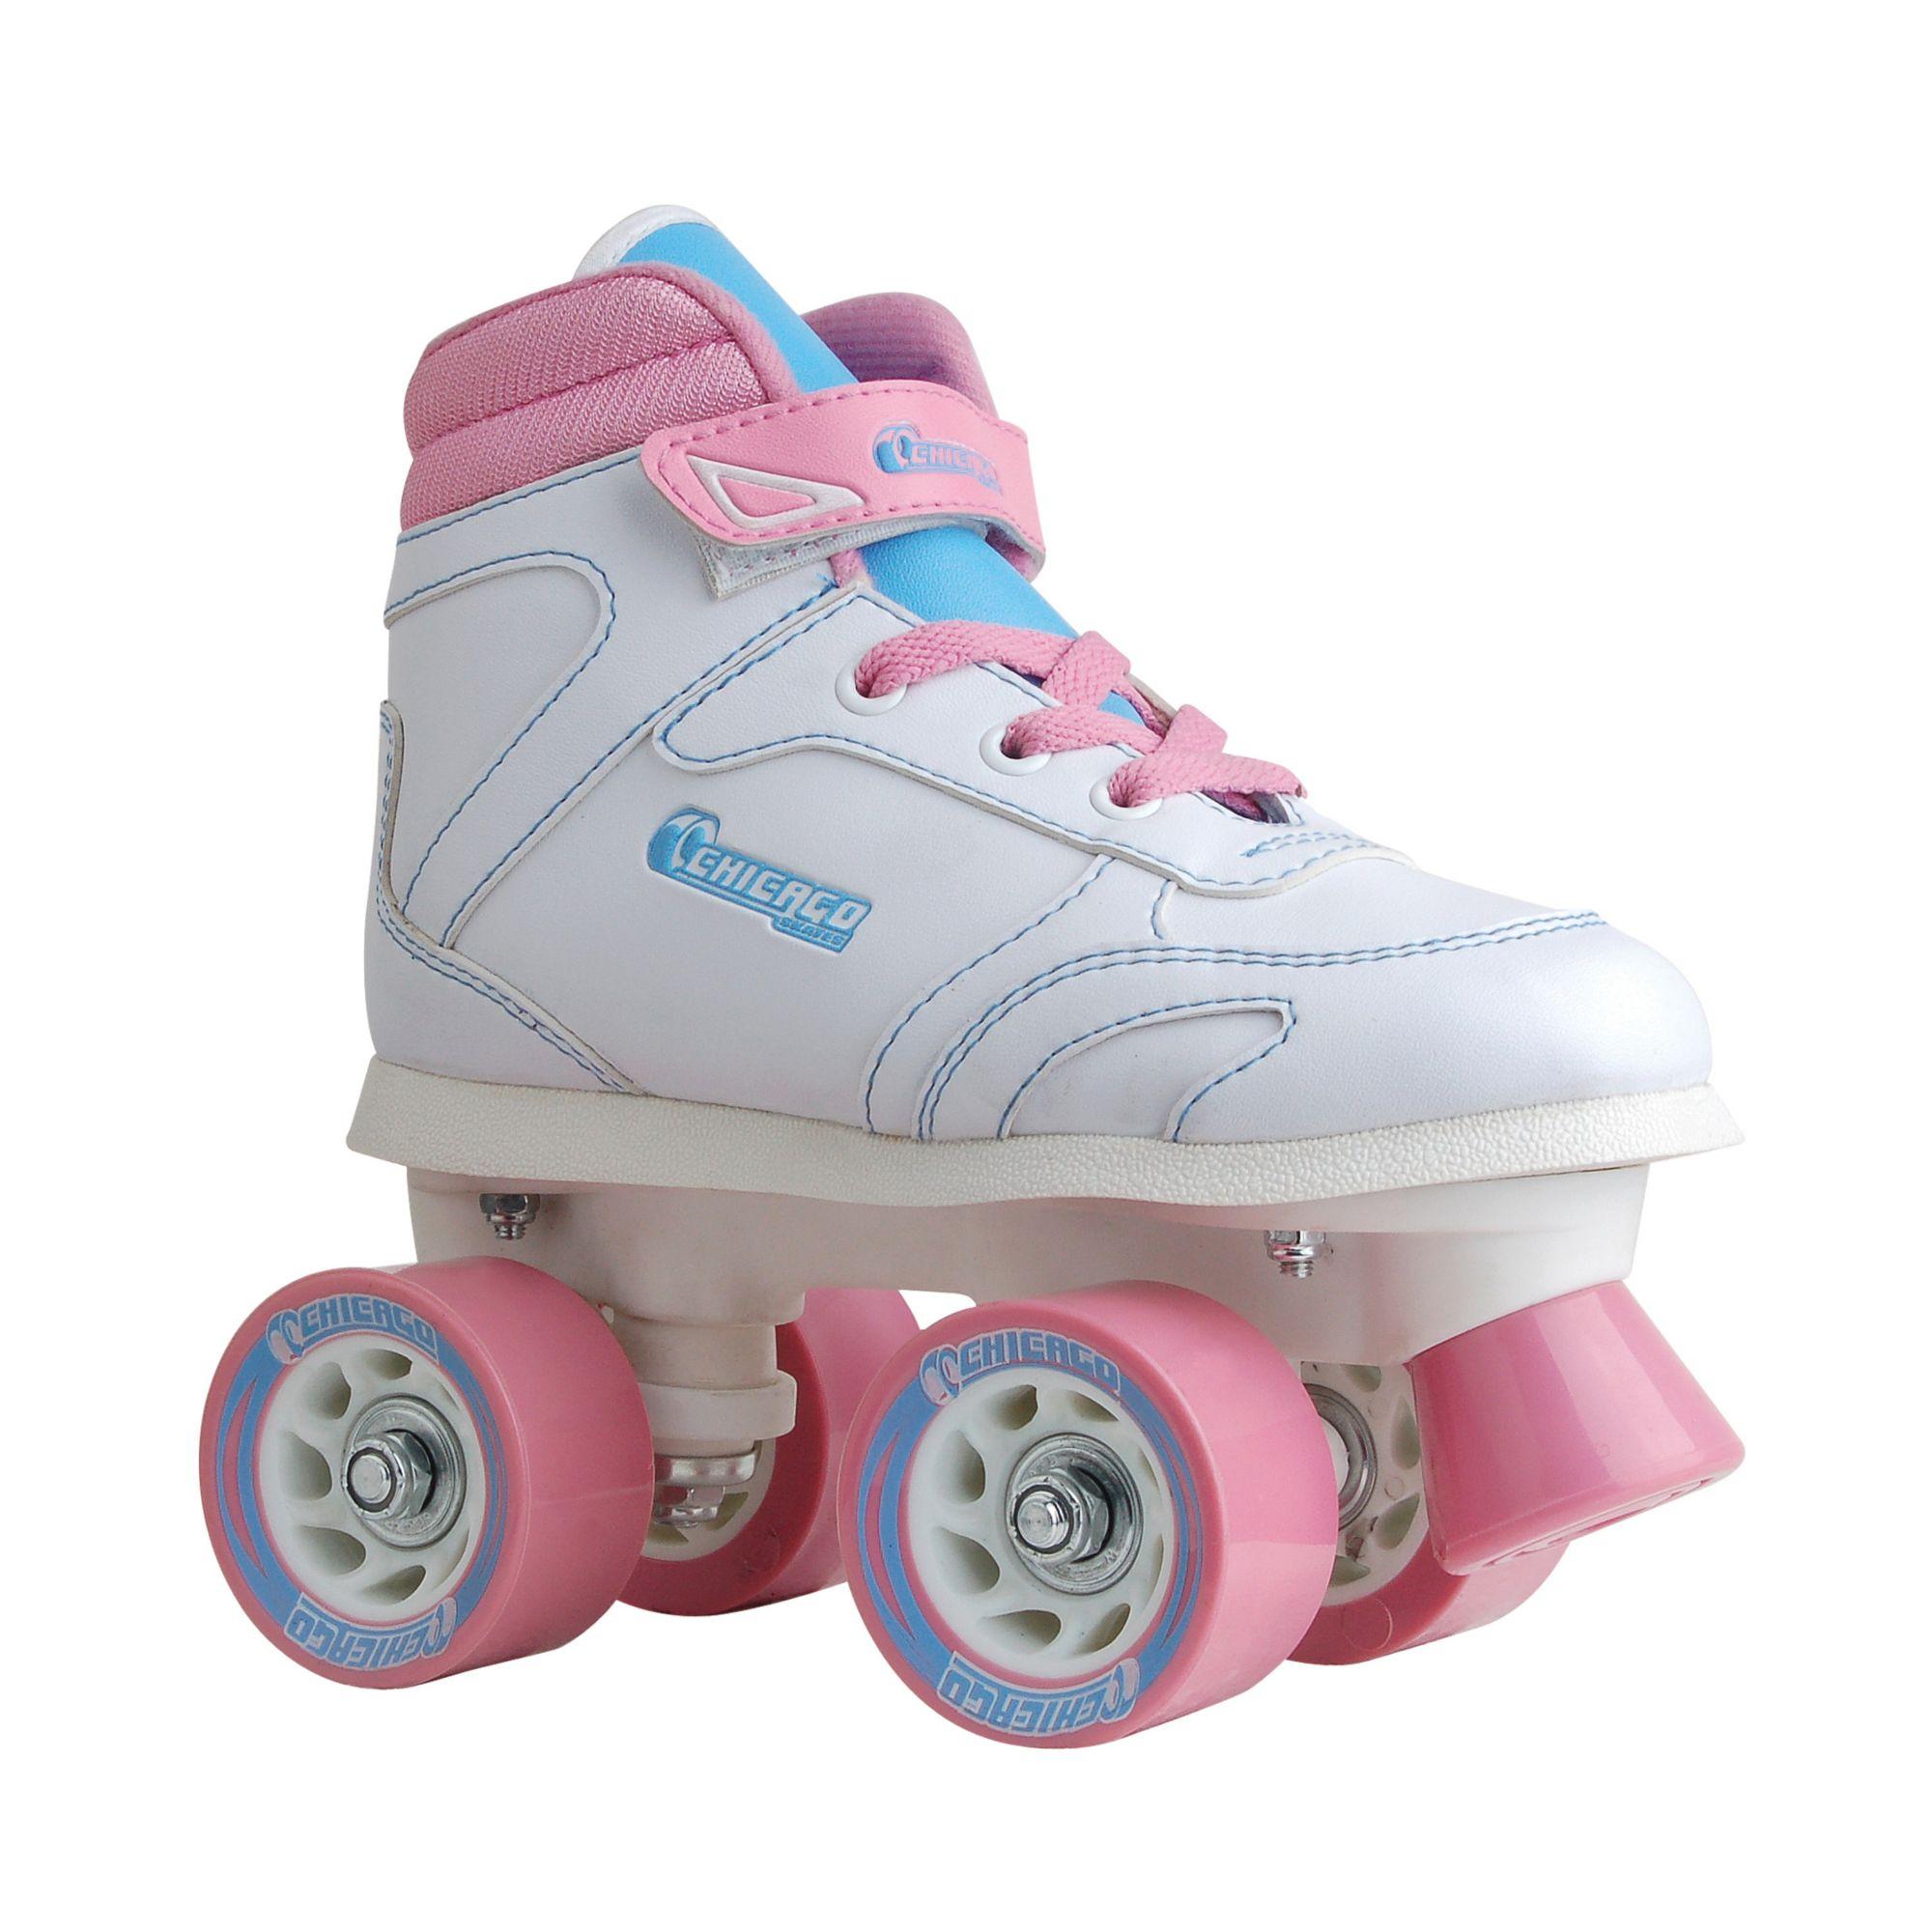 Roller skates for plus size - Noimagefound